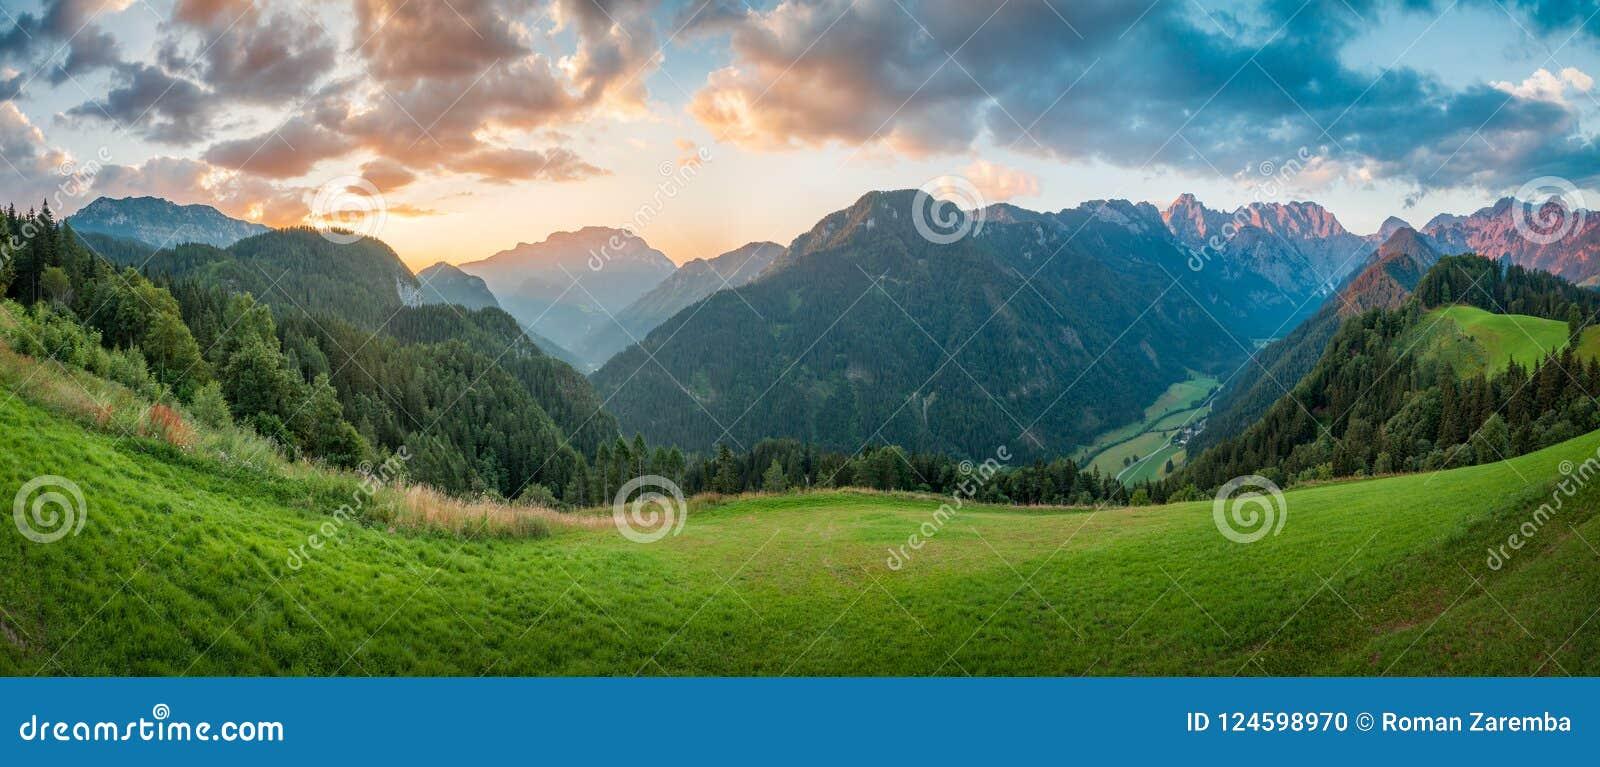 Slovenian Альпы на восходе солнца, панораме